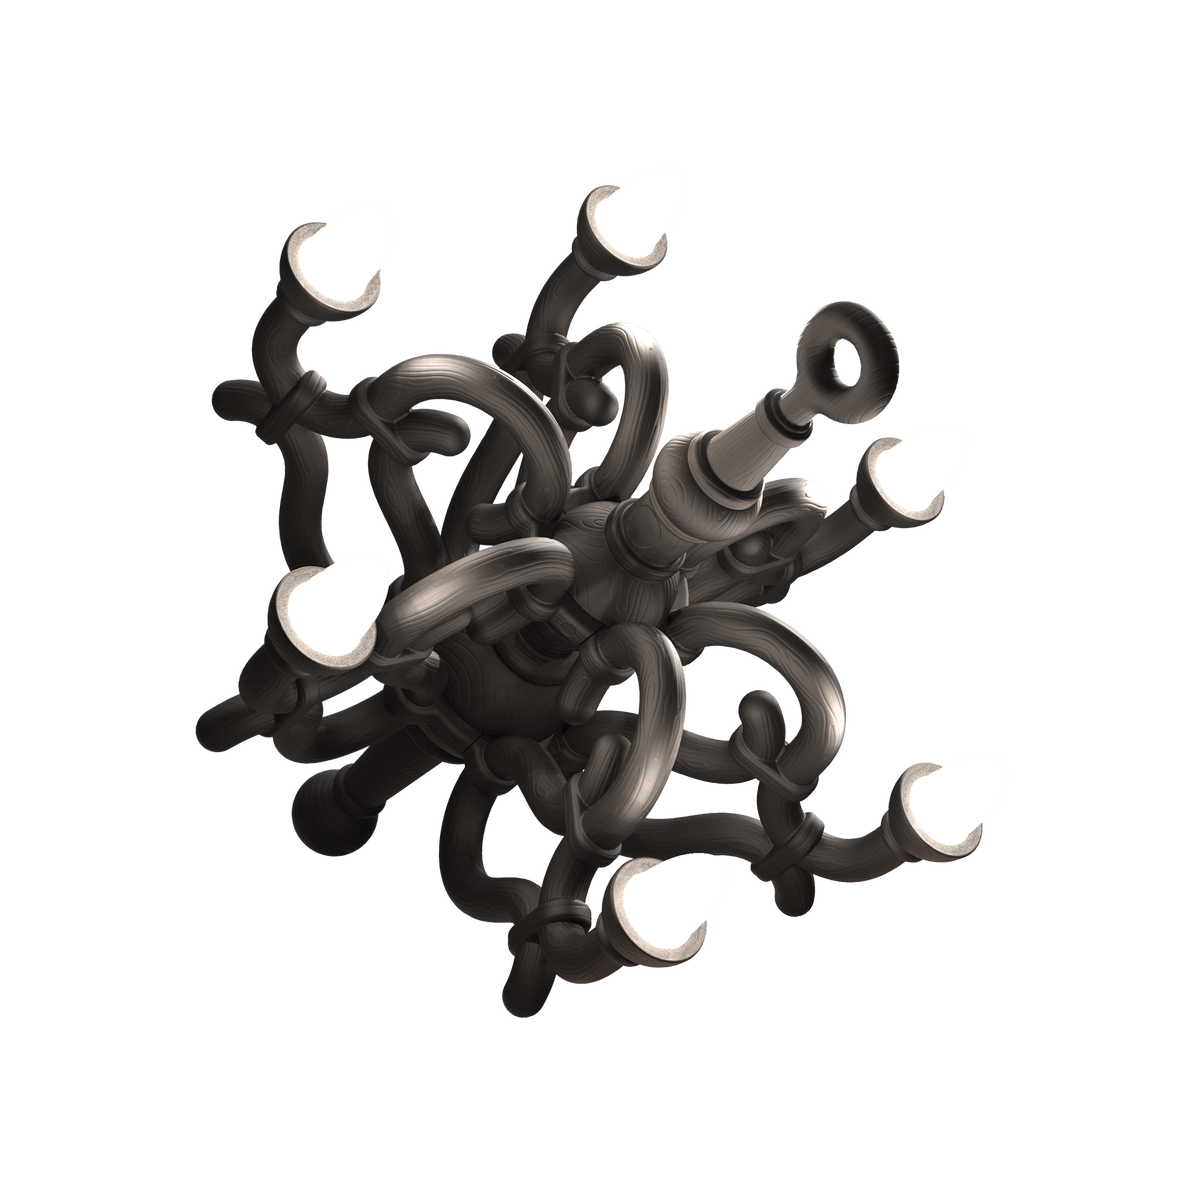 01 Qeeboo Fallen Chendalier M By Studio Job Black